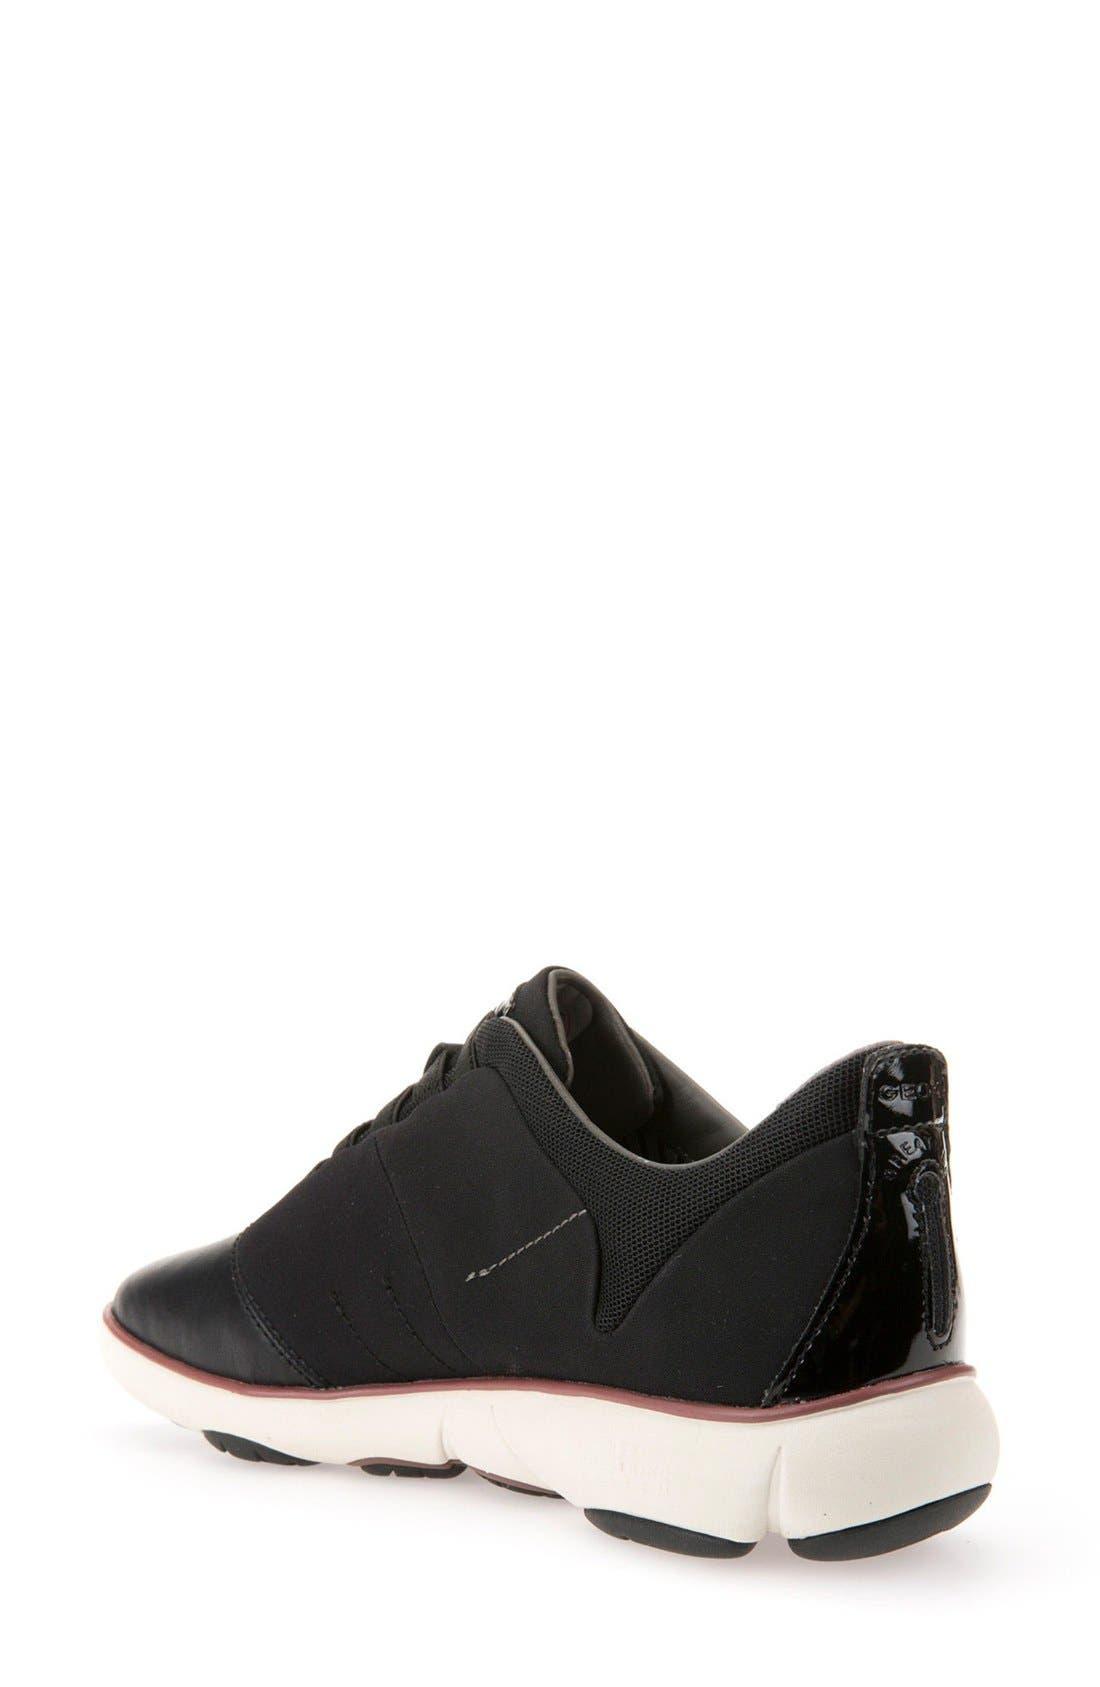 'Nebula' Sneaker,                             Alternate thumbnail 2, color,                             001